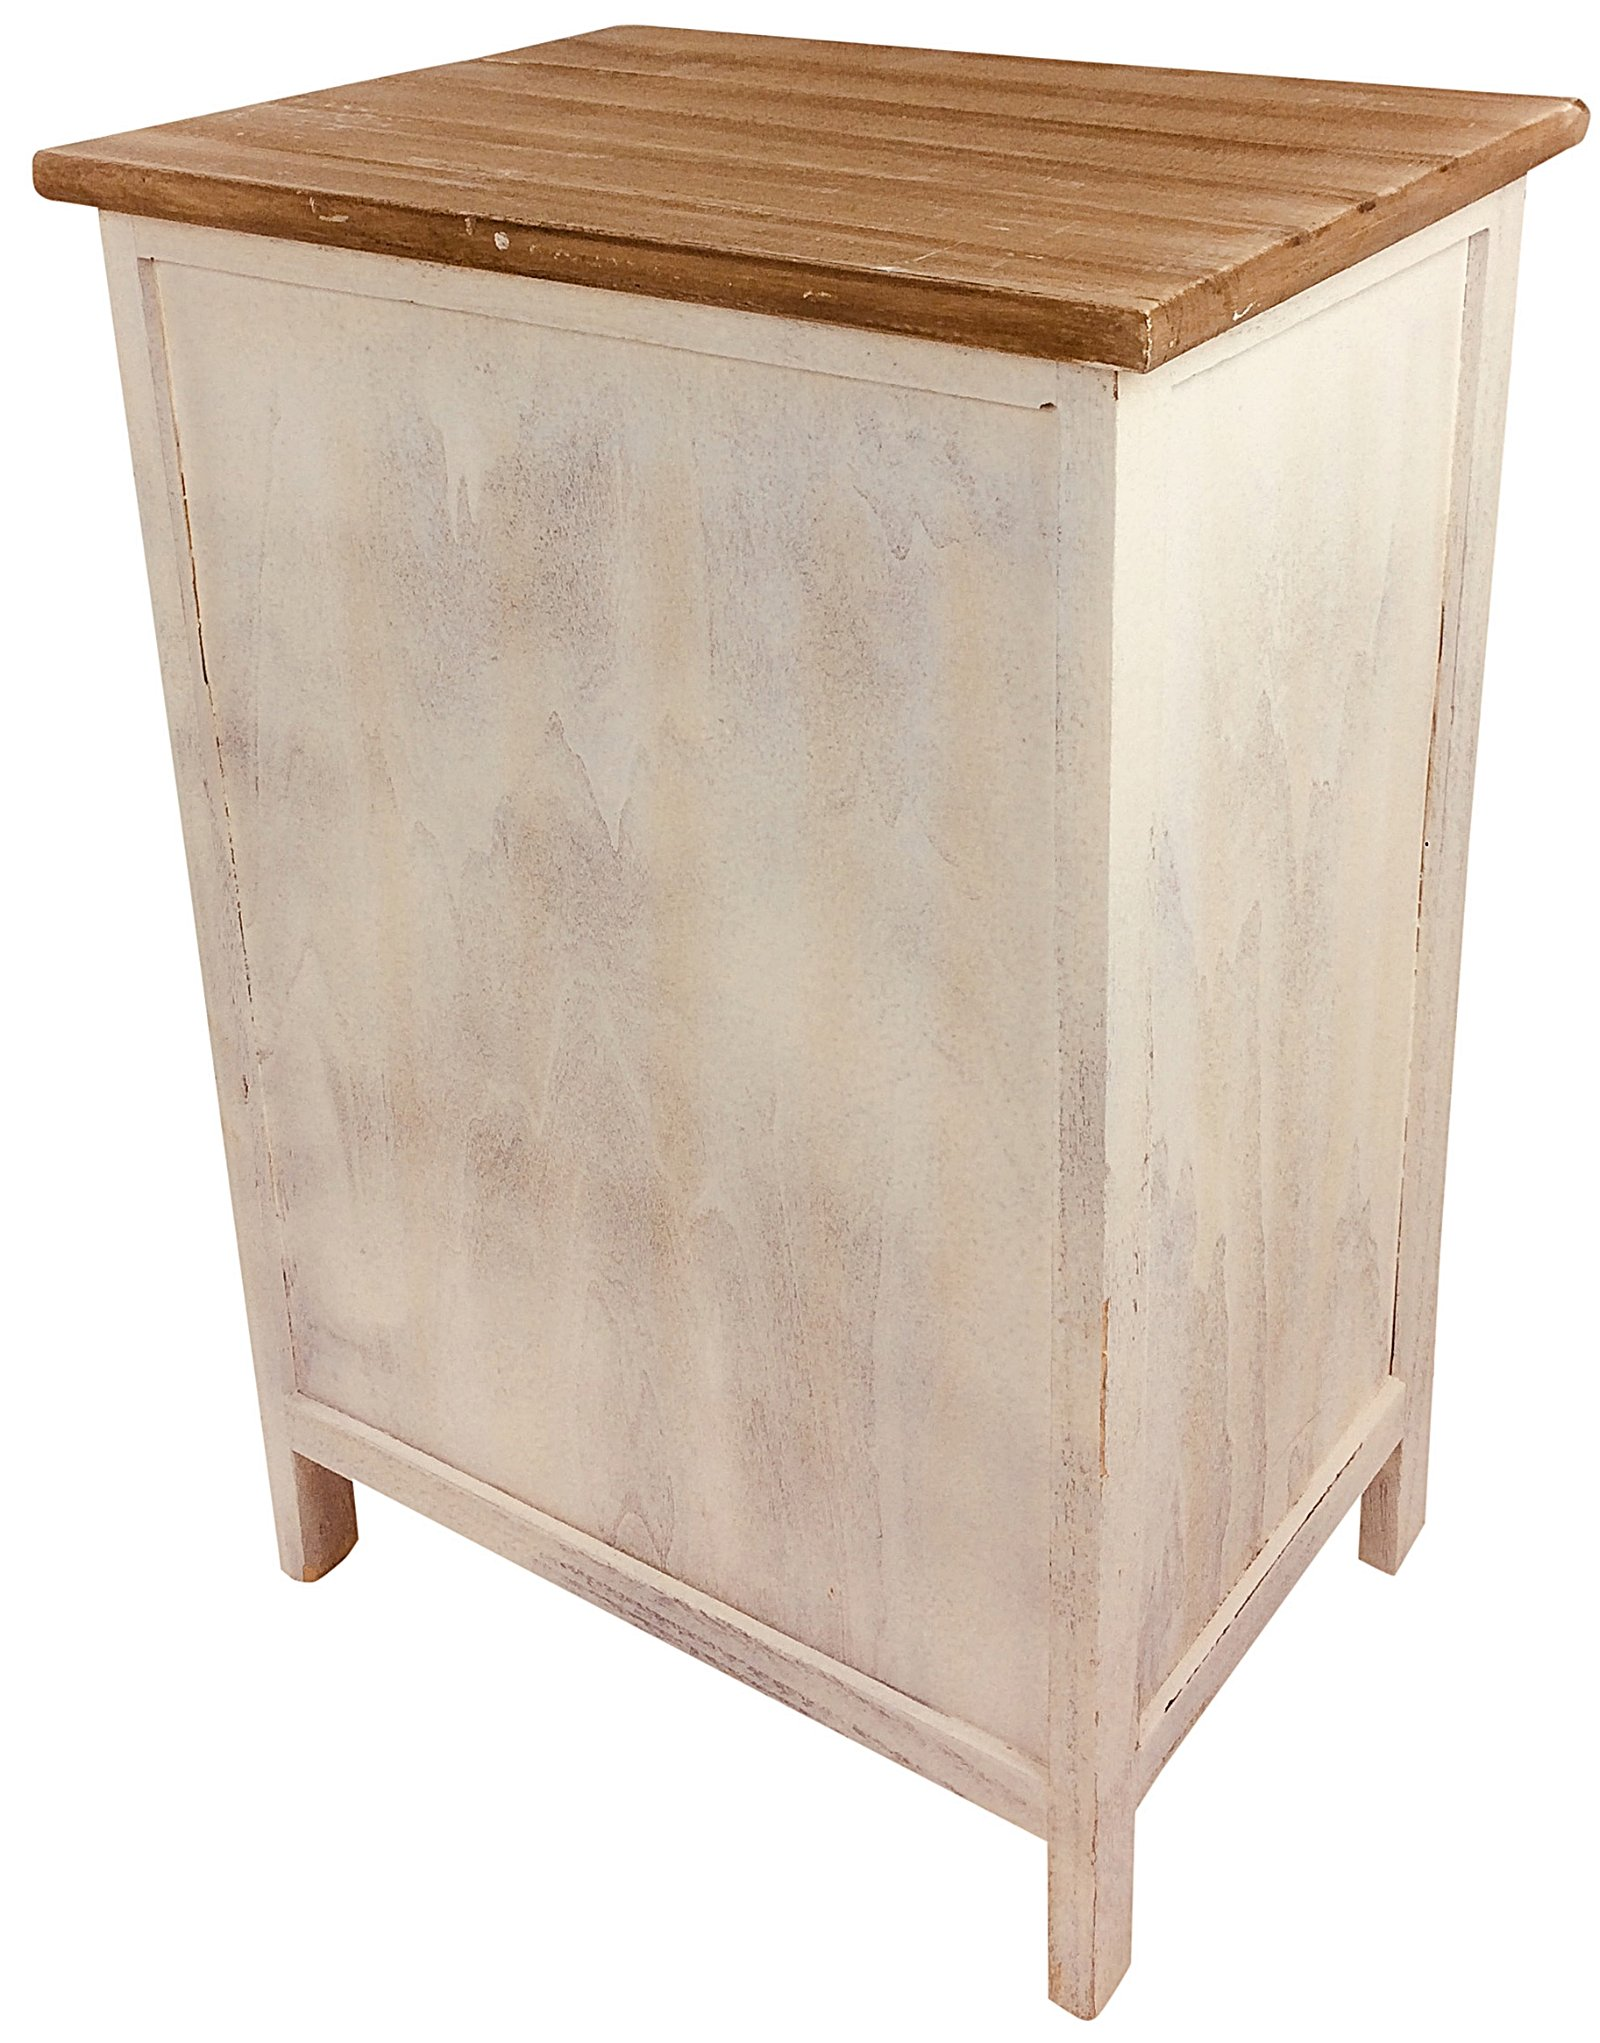 Wooden Love Heart Cabinet 58cm